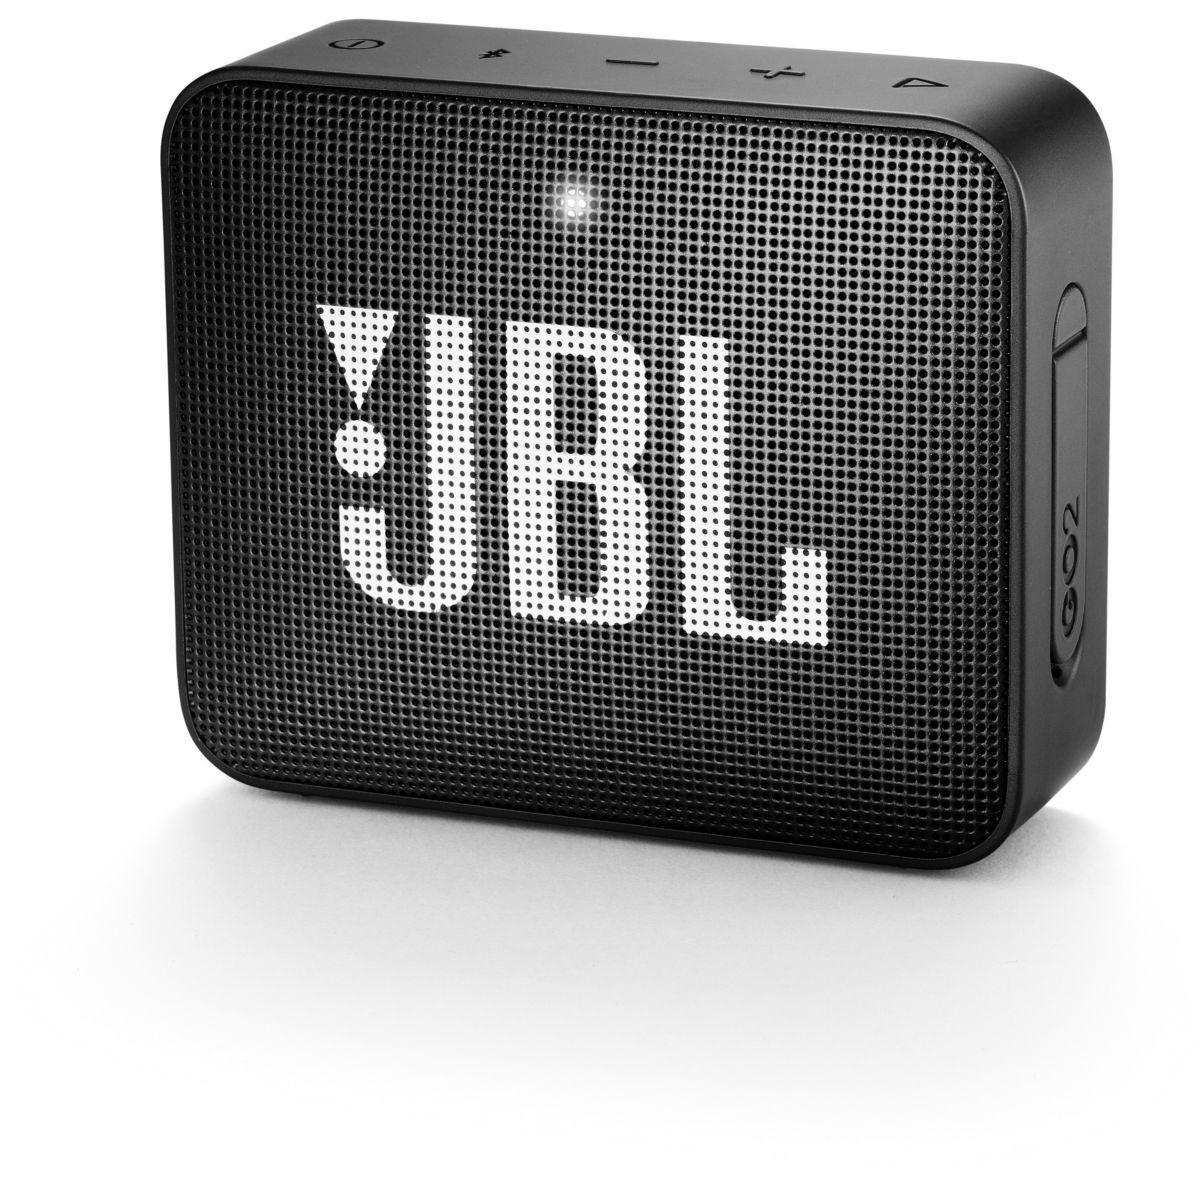 Enceinte bluetooth jbl go 2 noir - livraison offerte : code liv (photo)